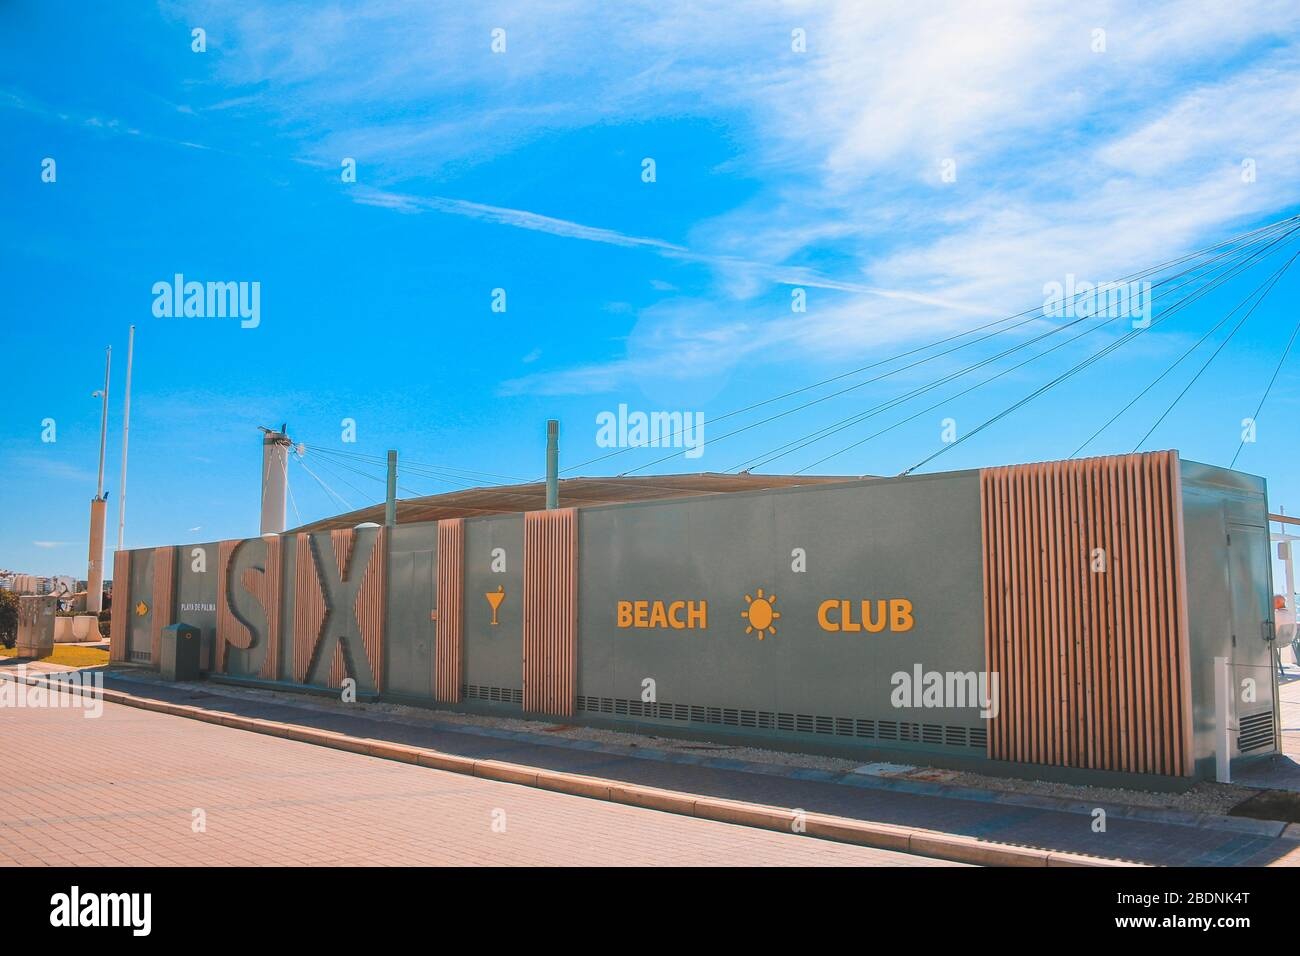 Mallorca, Spanien - März 27 2018: El Arenal Promenade mit der berühmten Ballermann 6 Strandbar Stockfoto